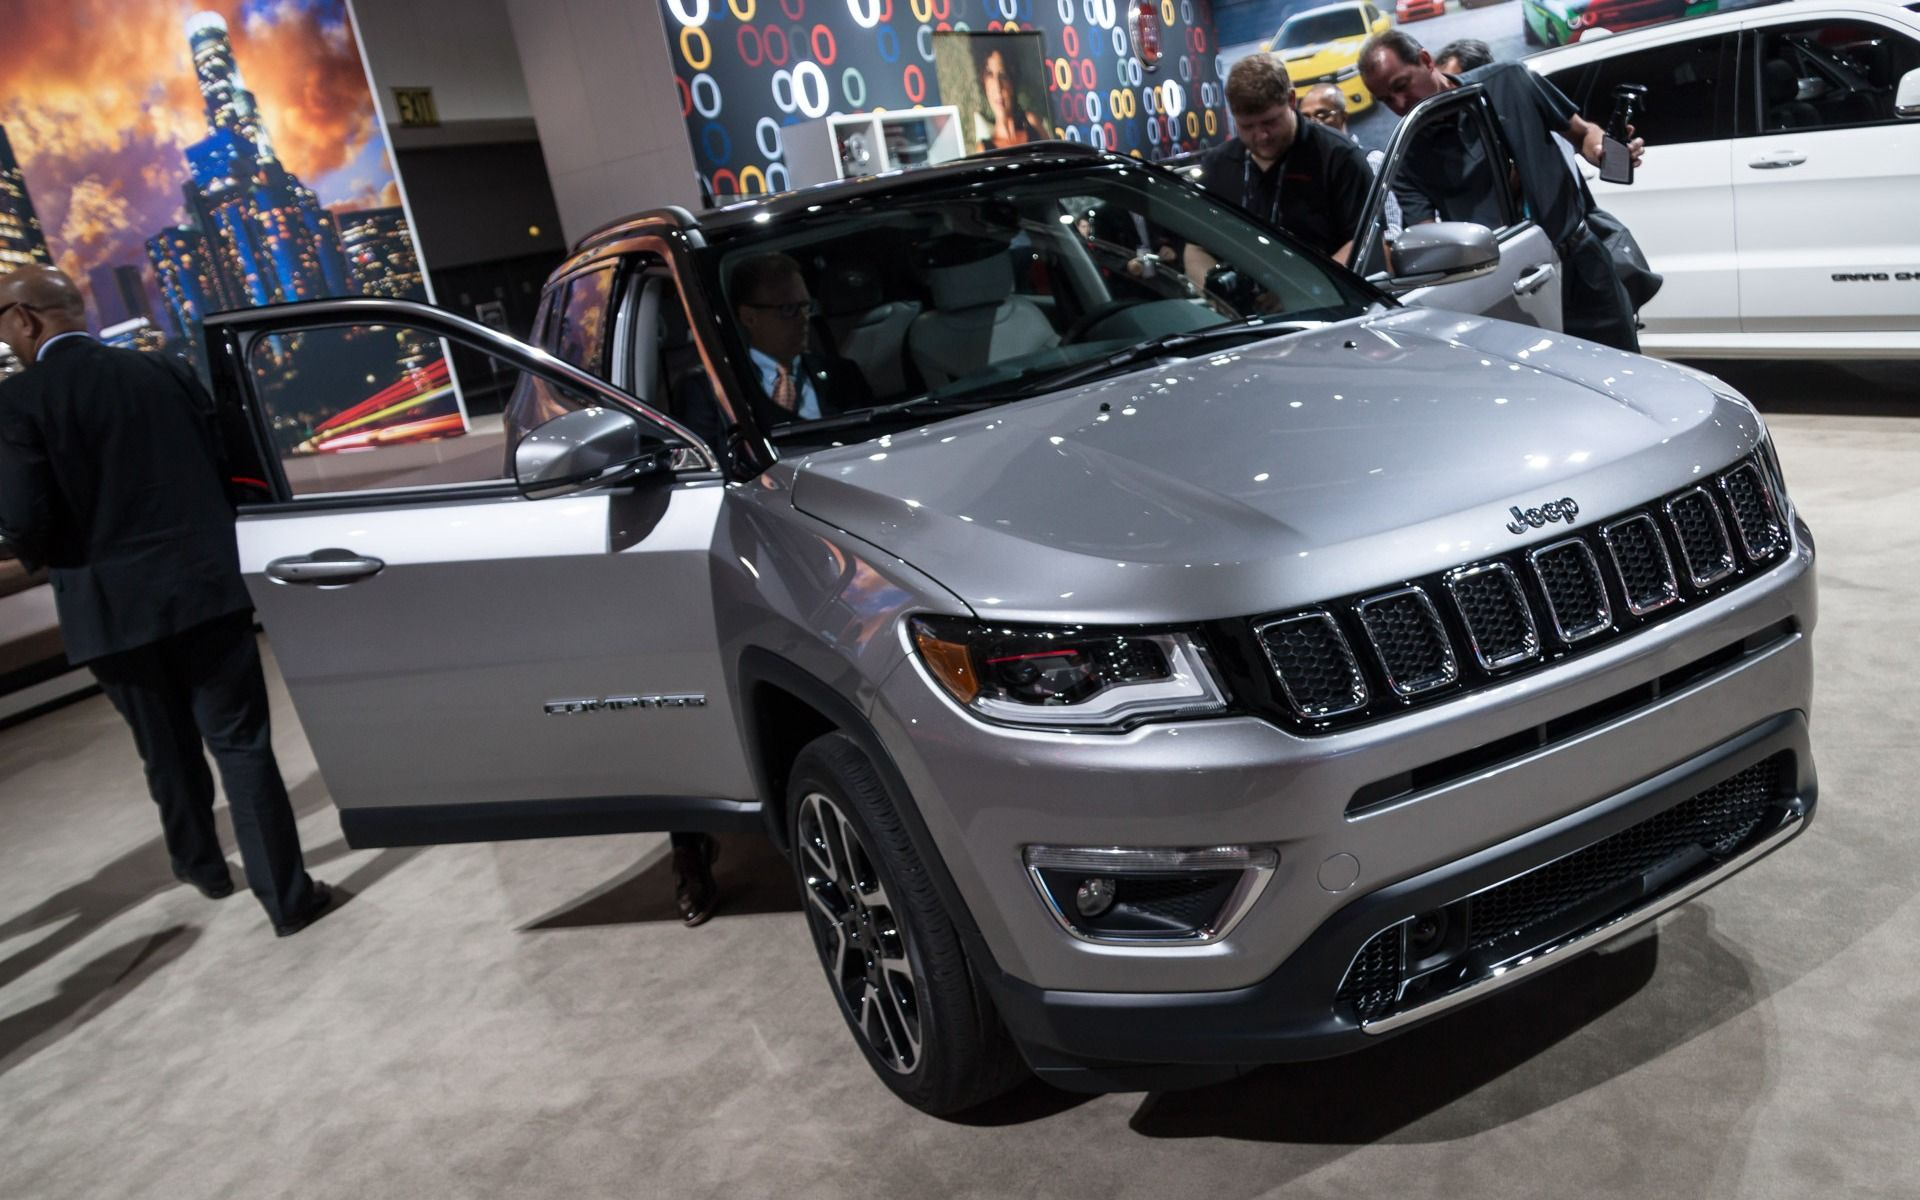 Le Jeep Compass 2017 Officiellement Devoile A Los Angeles Lux Cars Jeep Compass Sports Cars Luxury